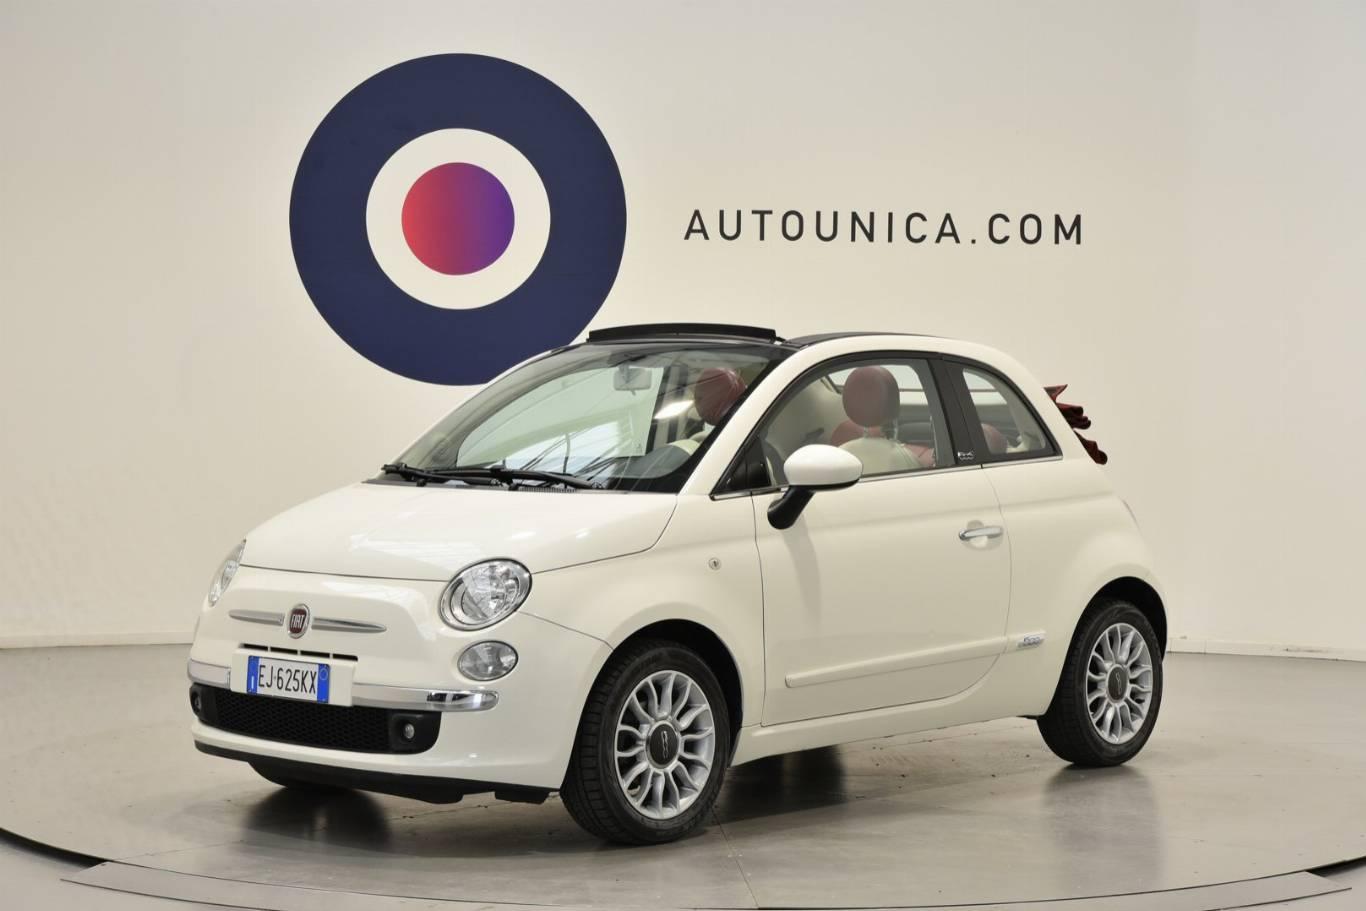 FIAT - 500C 1.2 LOUNGE CABRIO AUTOMATICA IDEALE NEOPATENTATI